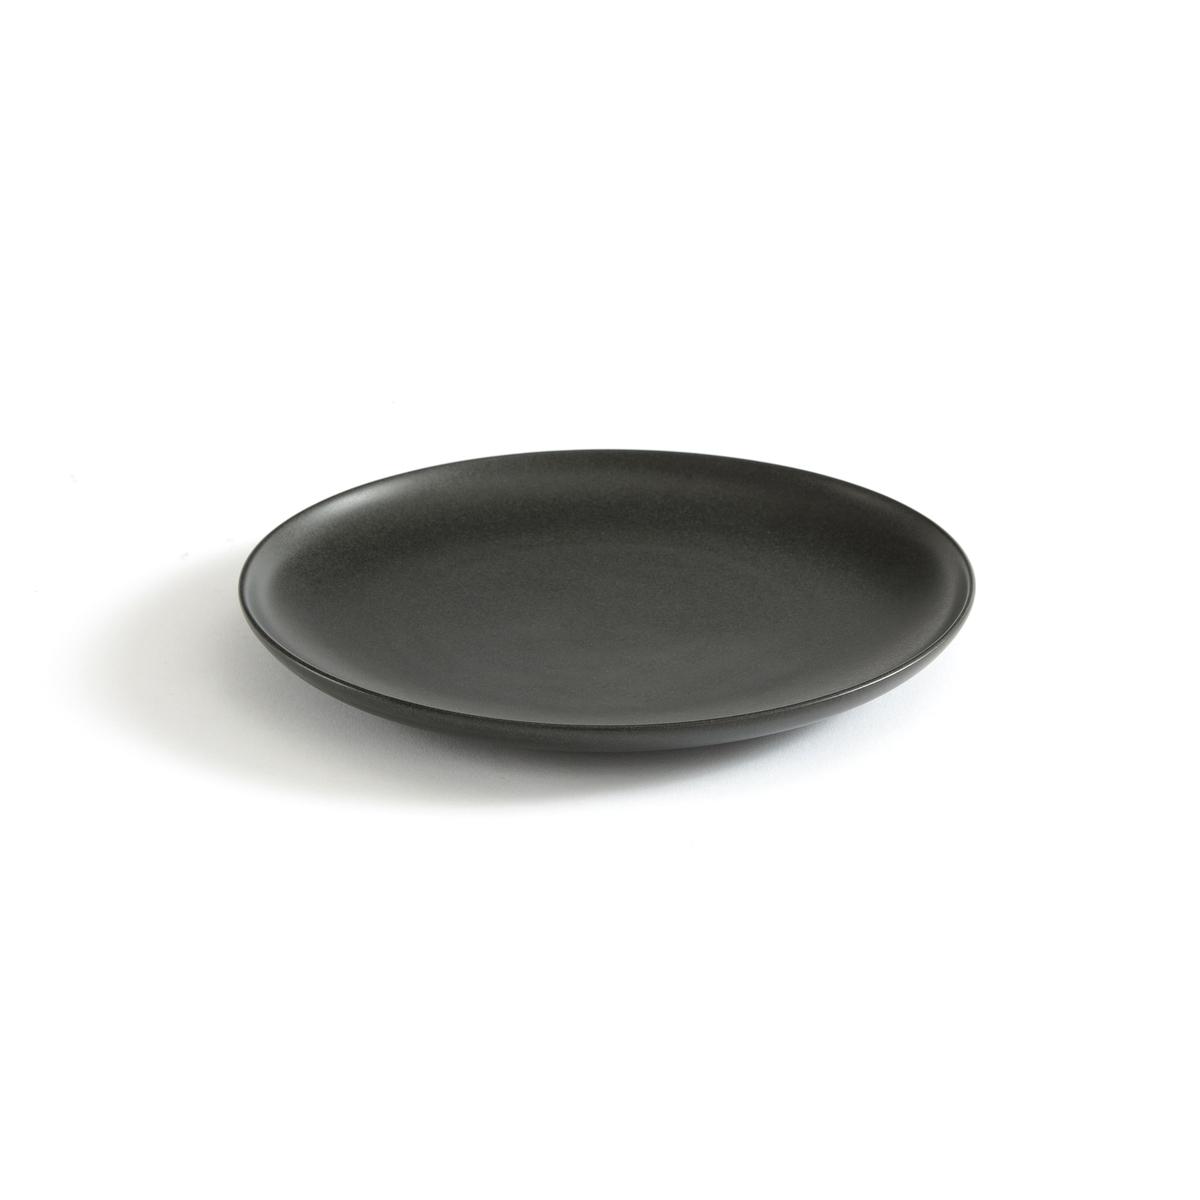 Banjit Dessert Plates, Set of 2